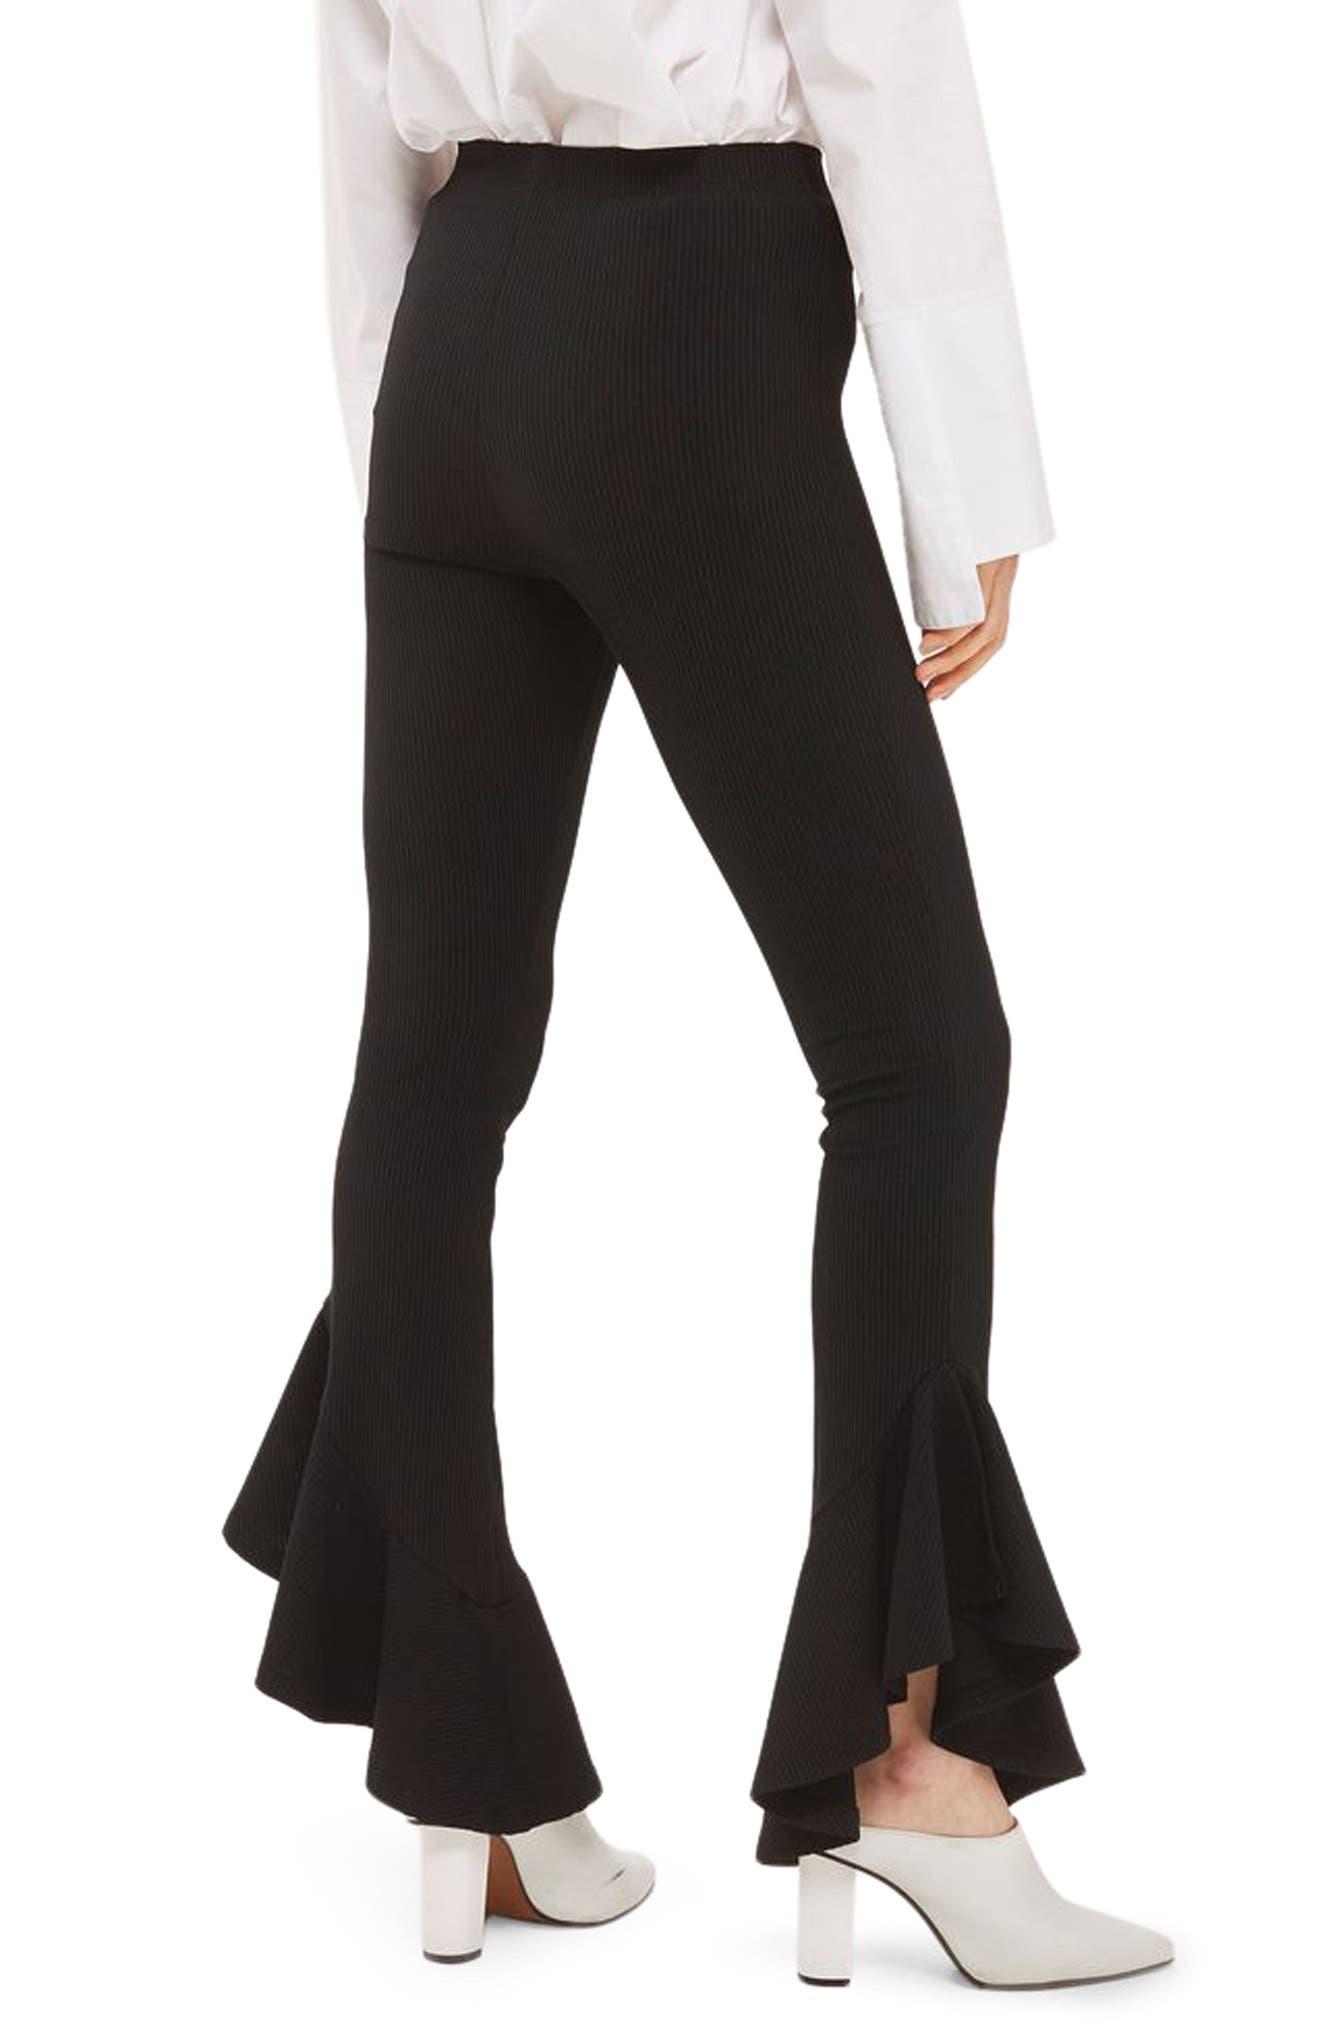 Mermaid Frill Flare Trousers,                             Alternate thumbnail 2, color,                             Black